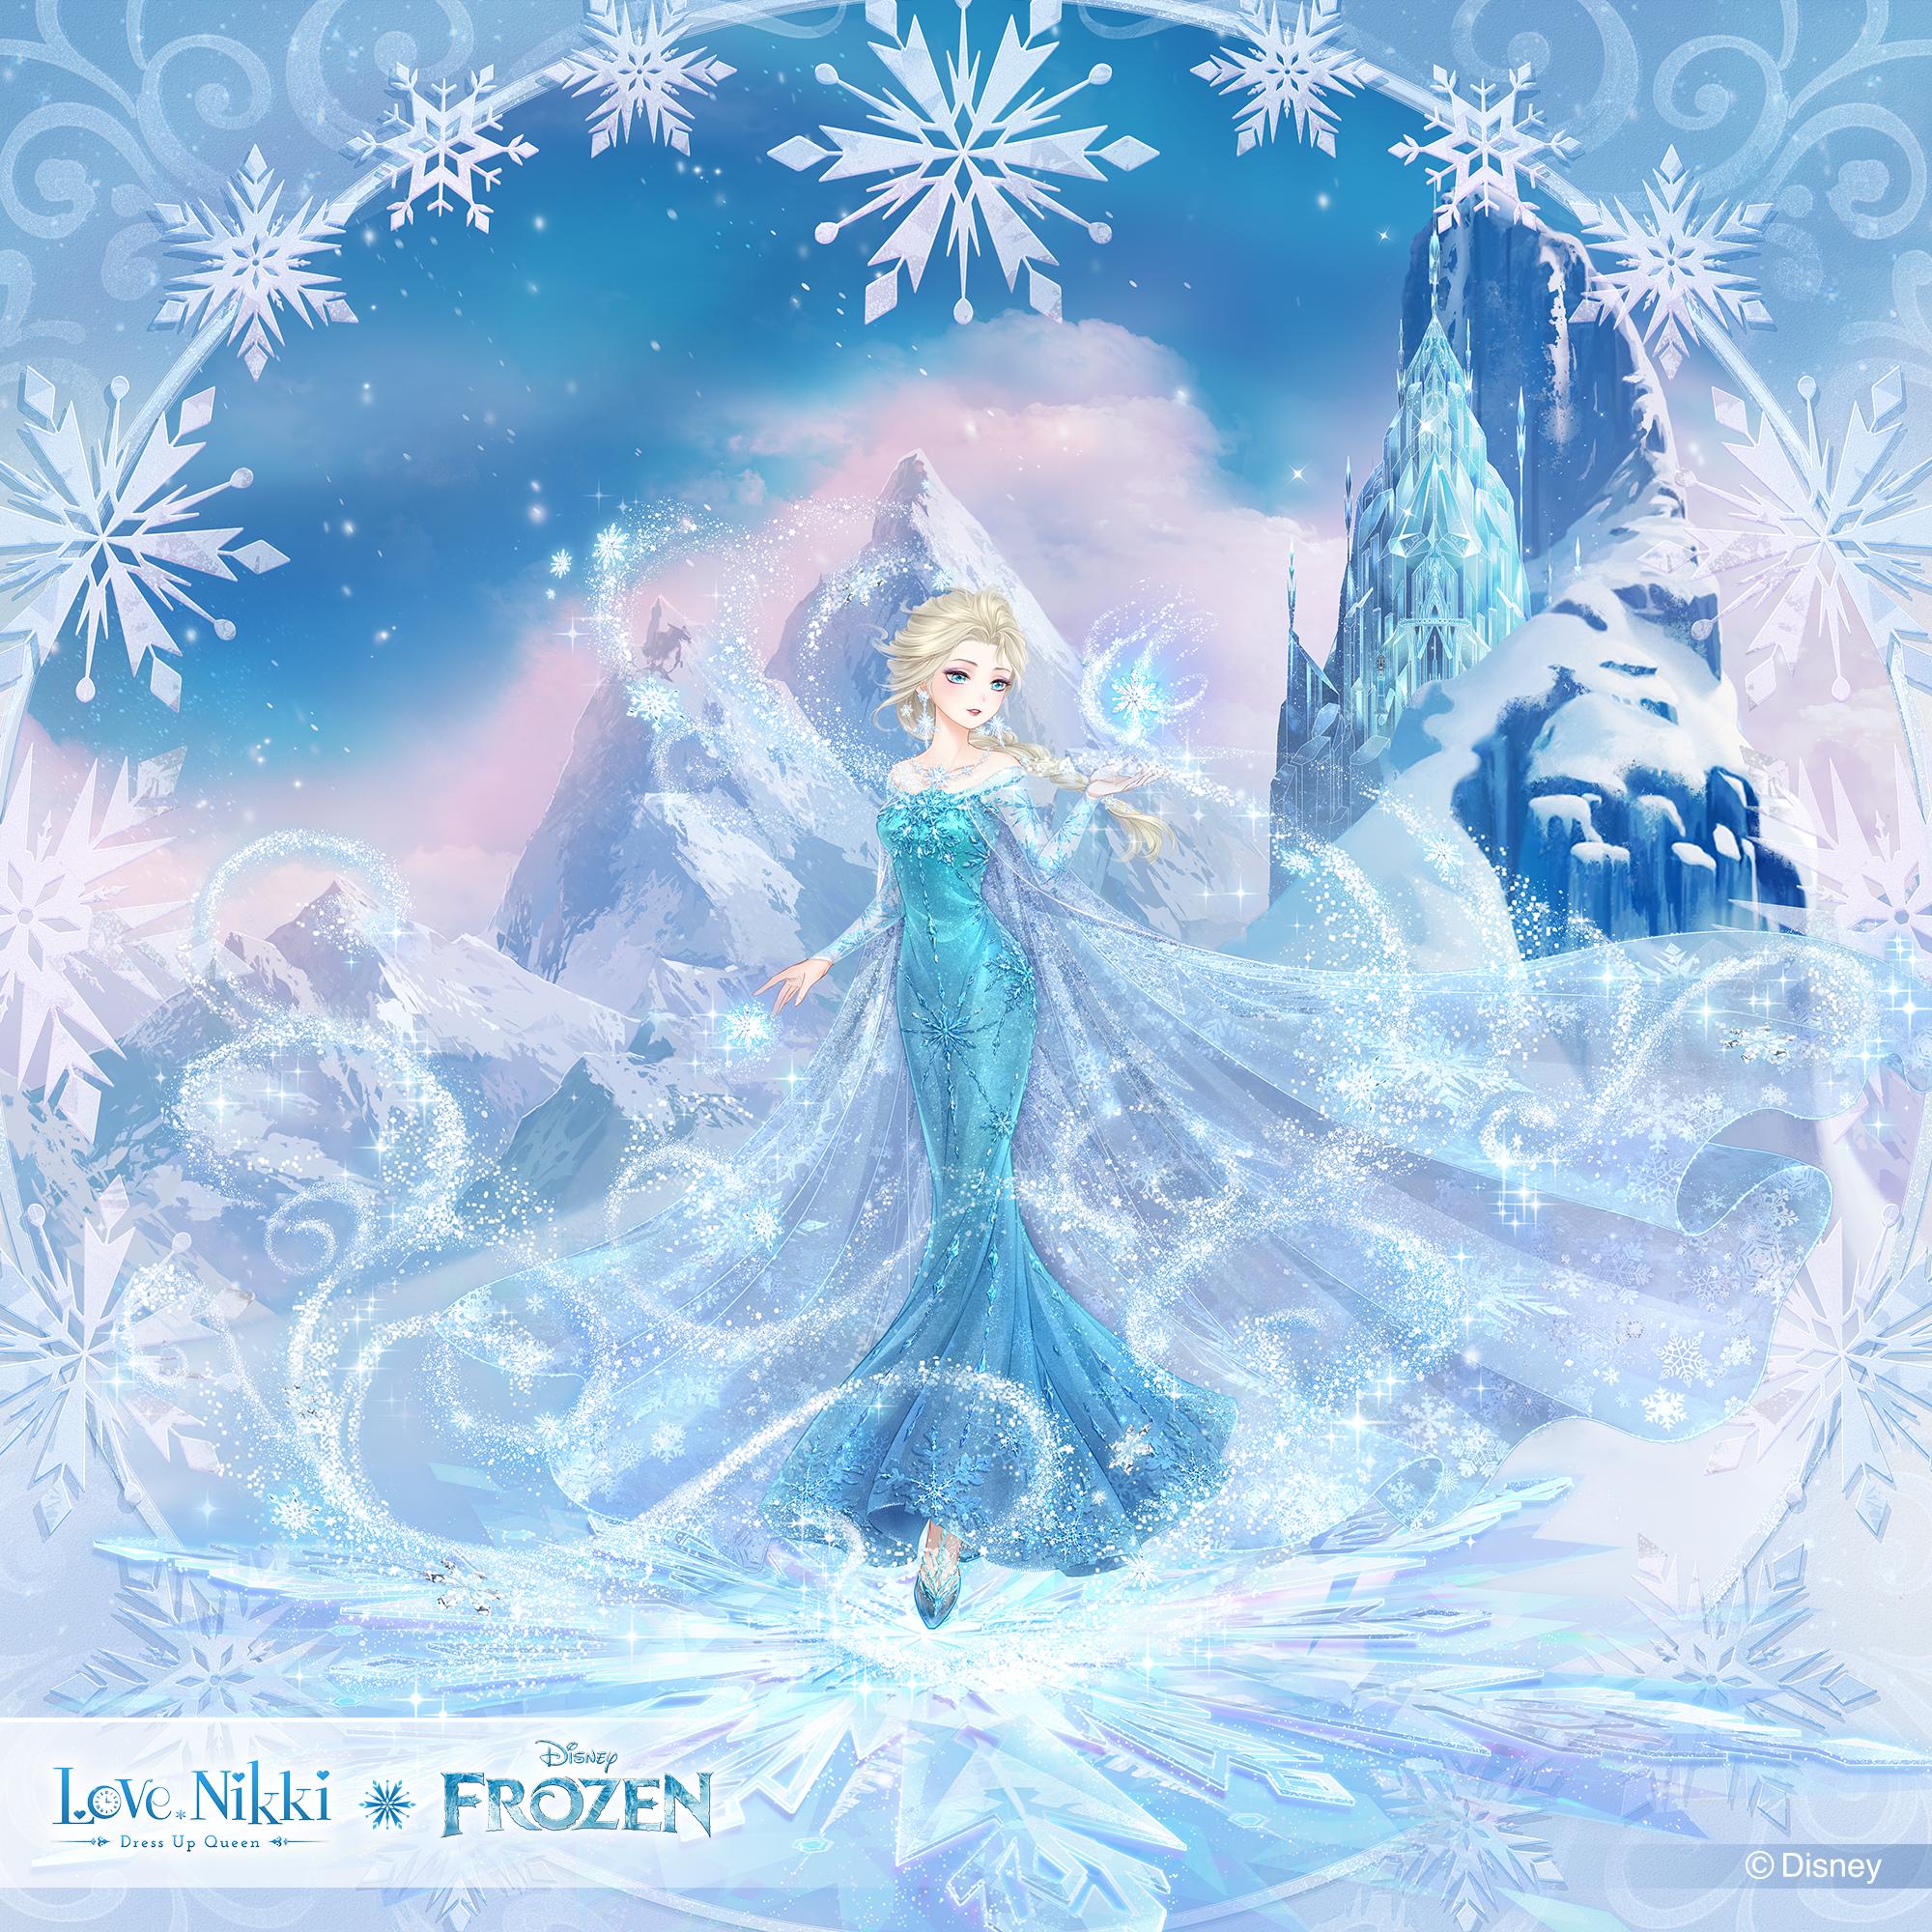 Love Nikki Christmas 2020 Collaboration Suits   Love Nikki Dress UP Queen! Wiki   Fandom